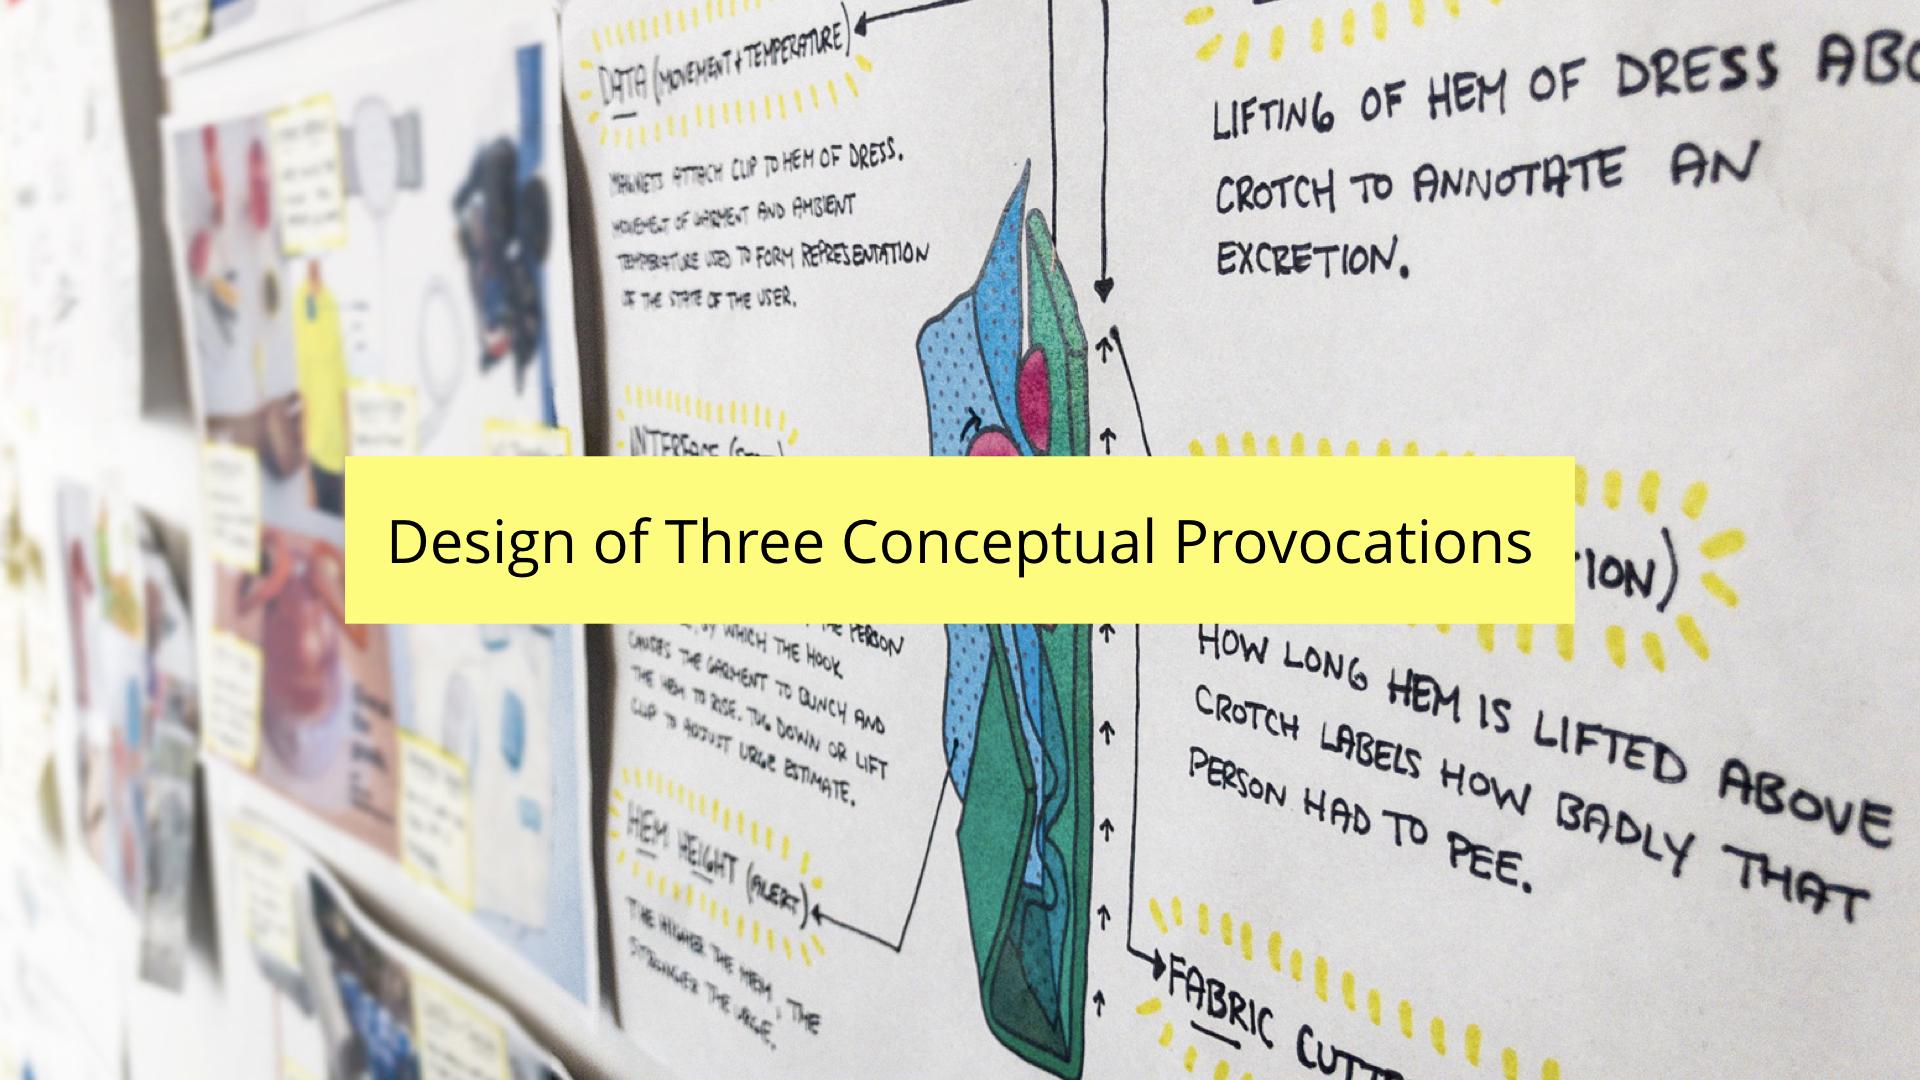 DIS 2019 paper presentation - design of three conceptual provocations